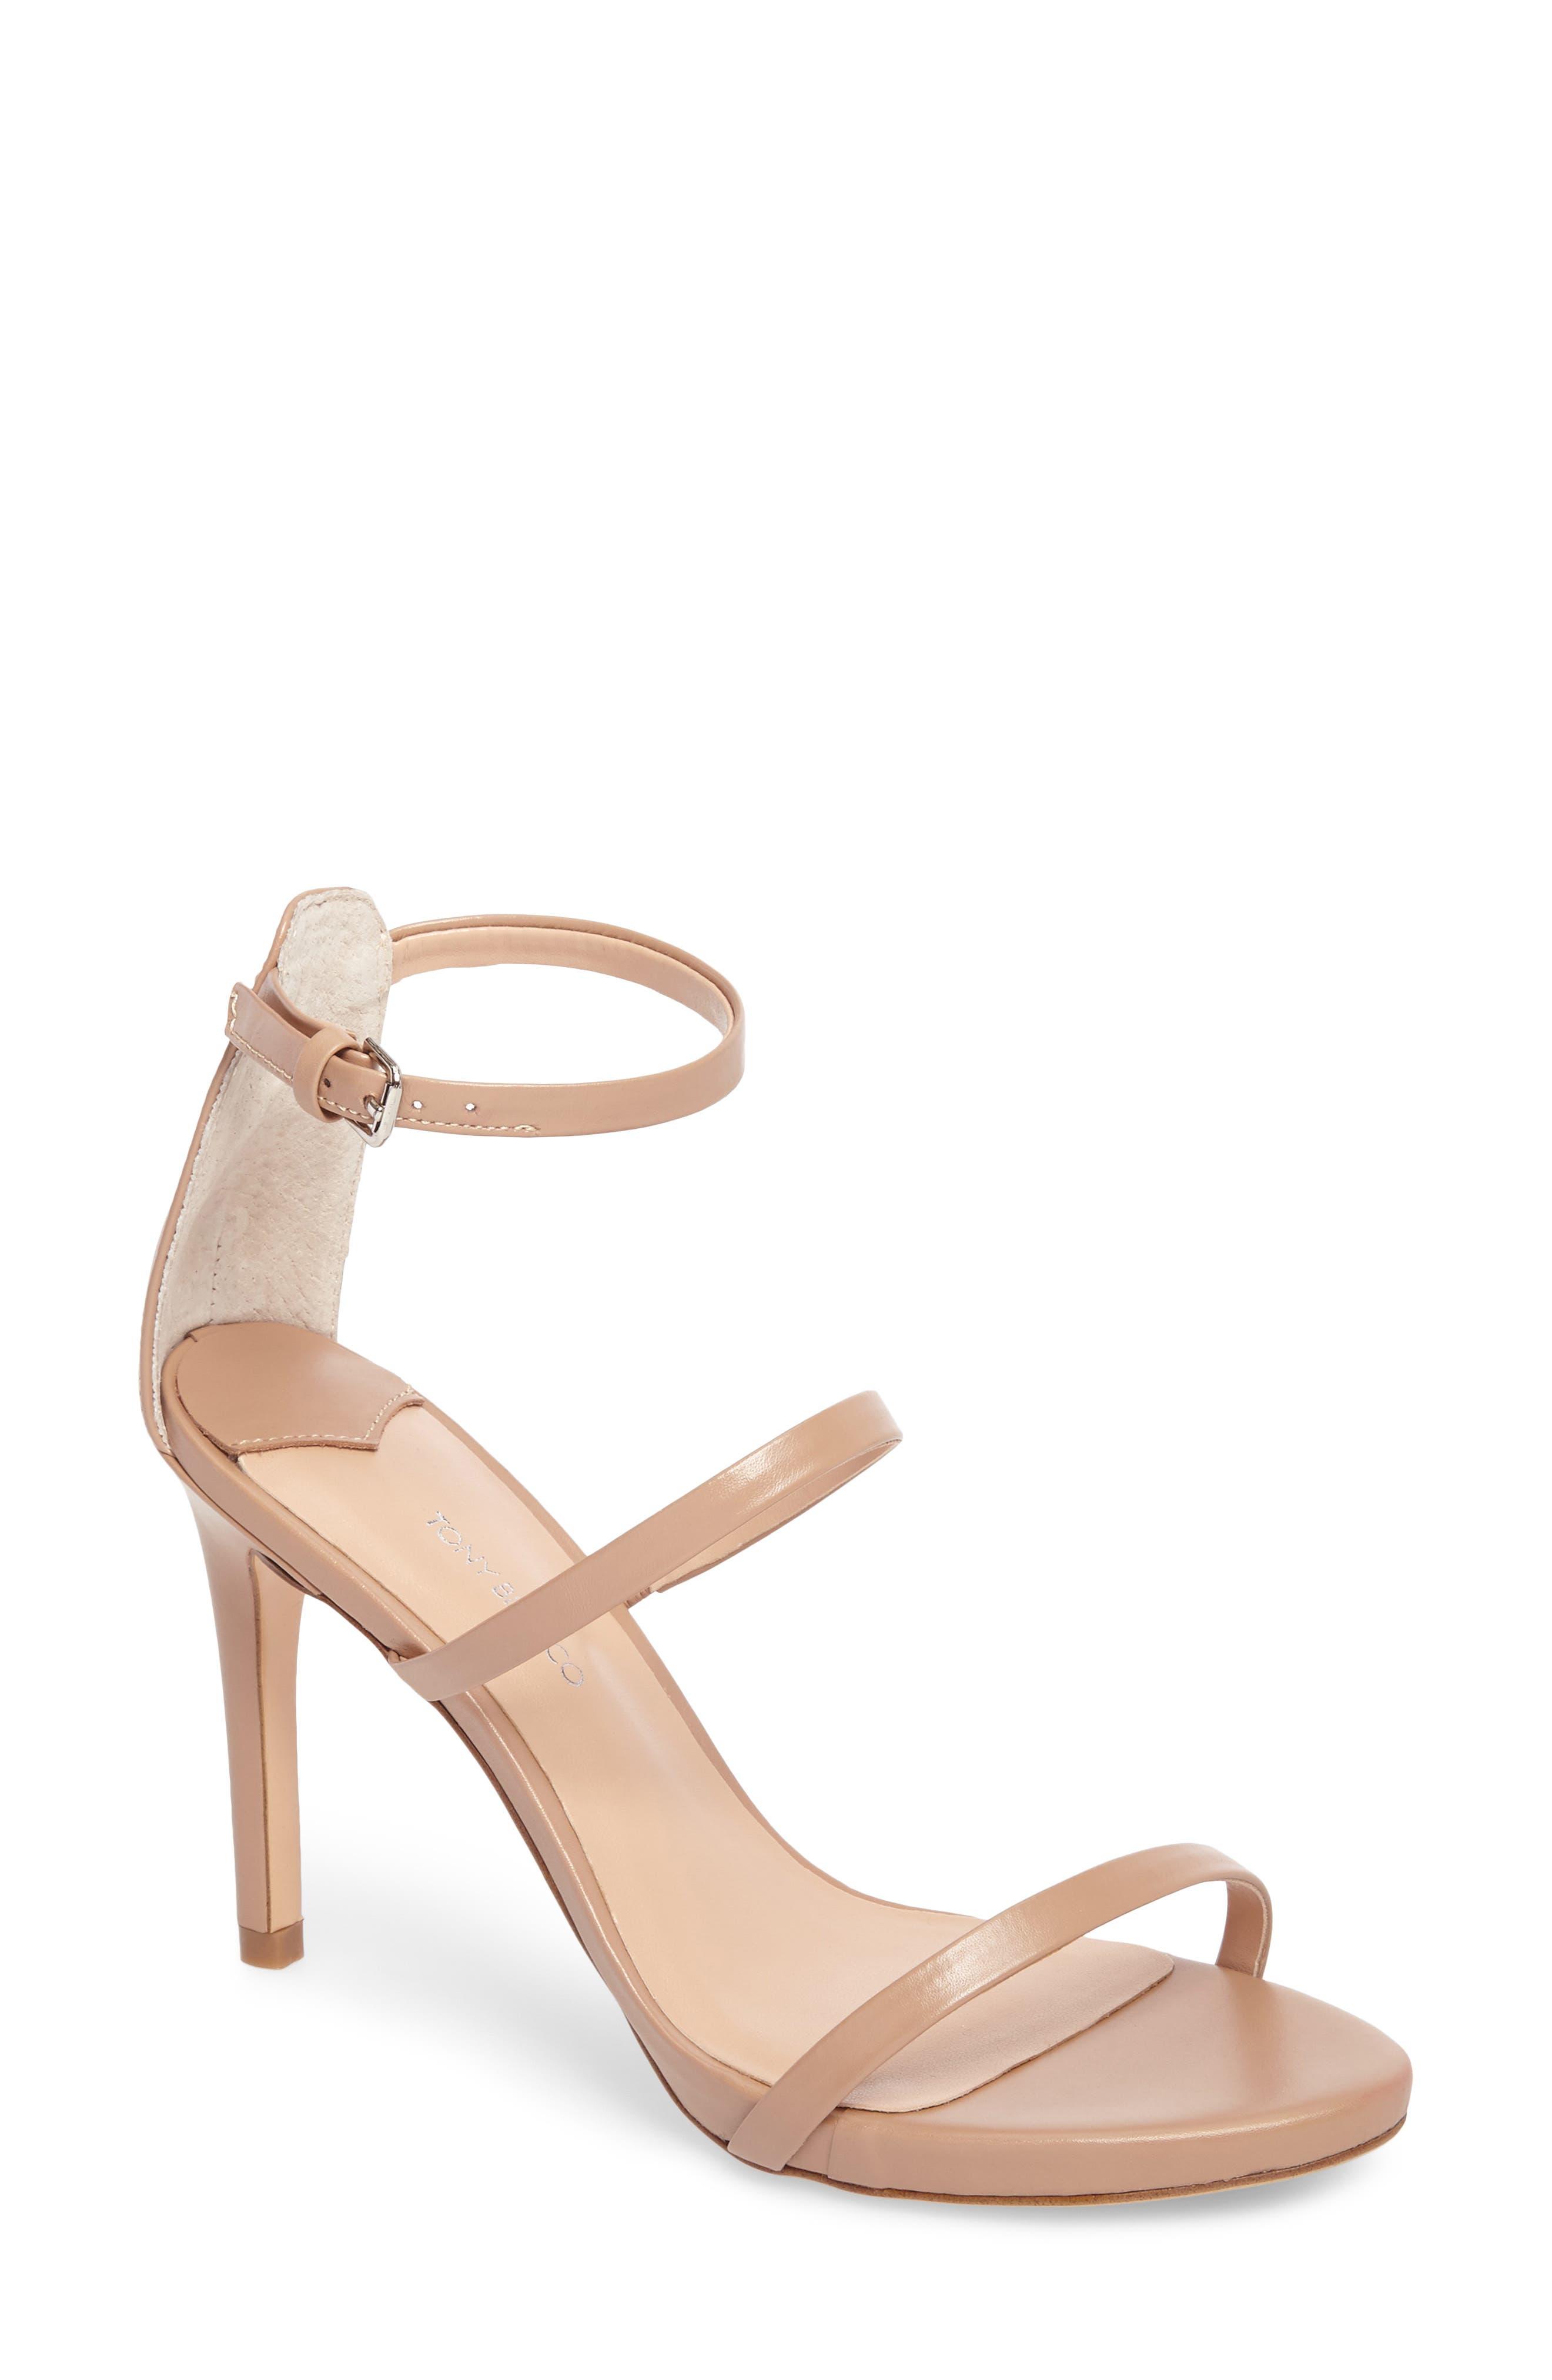 Carey Three-Strap Sandal,                         Main,                         color, Skin Capretto Leather